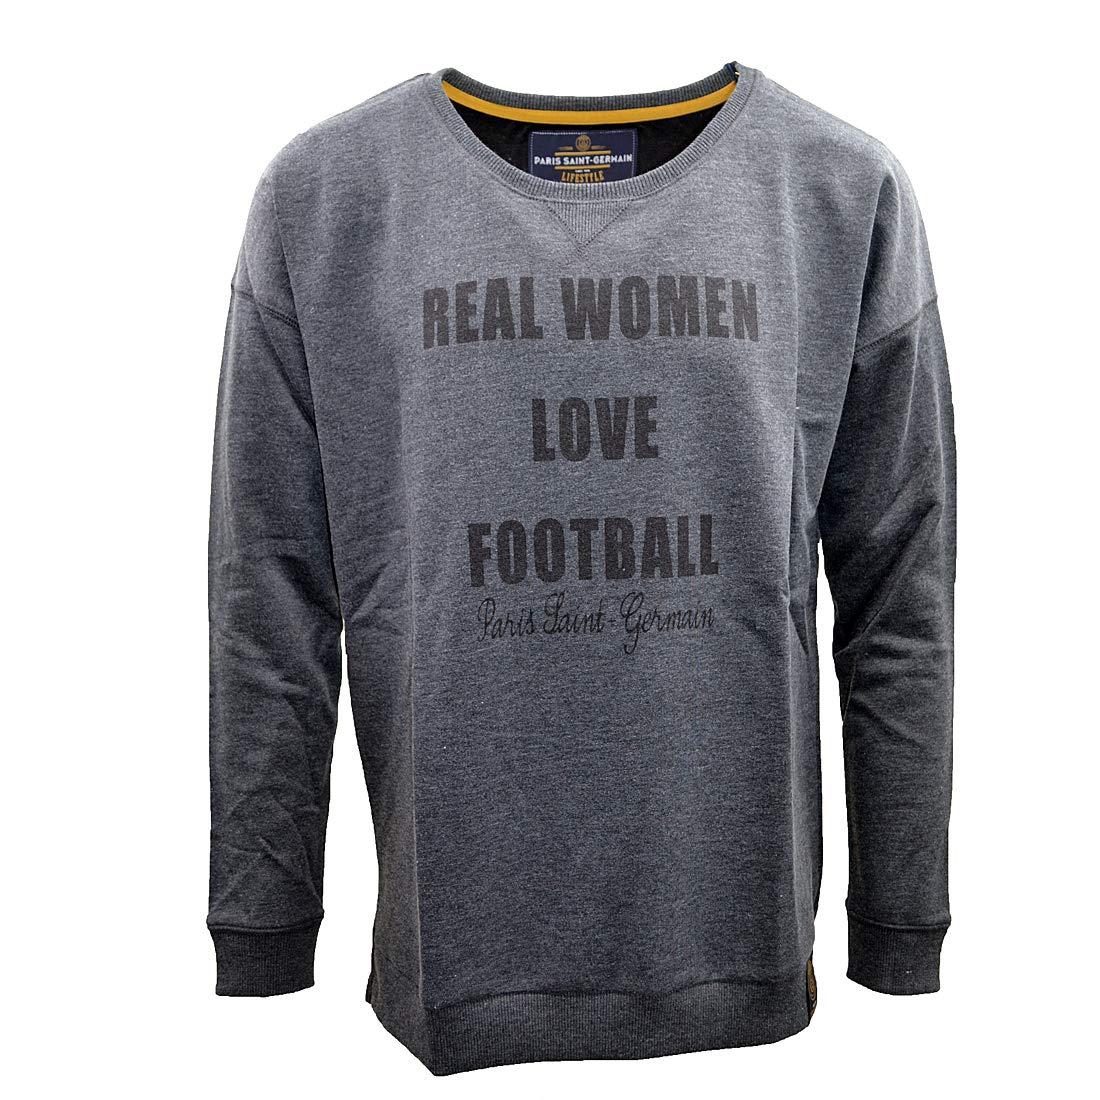 Gris. Sweat PSG Vintage Women Love Football Licence Officielle